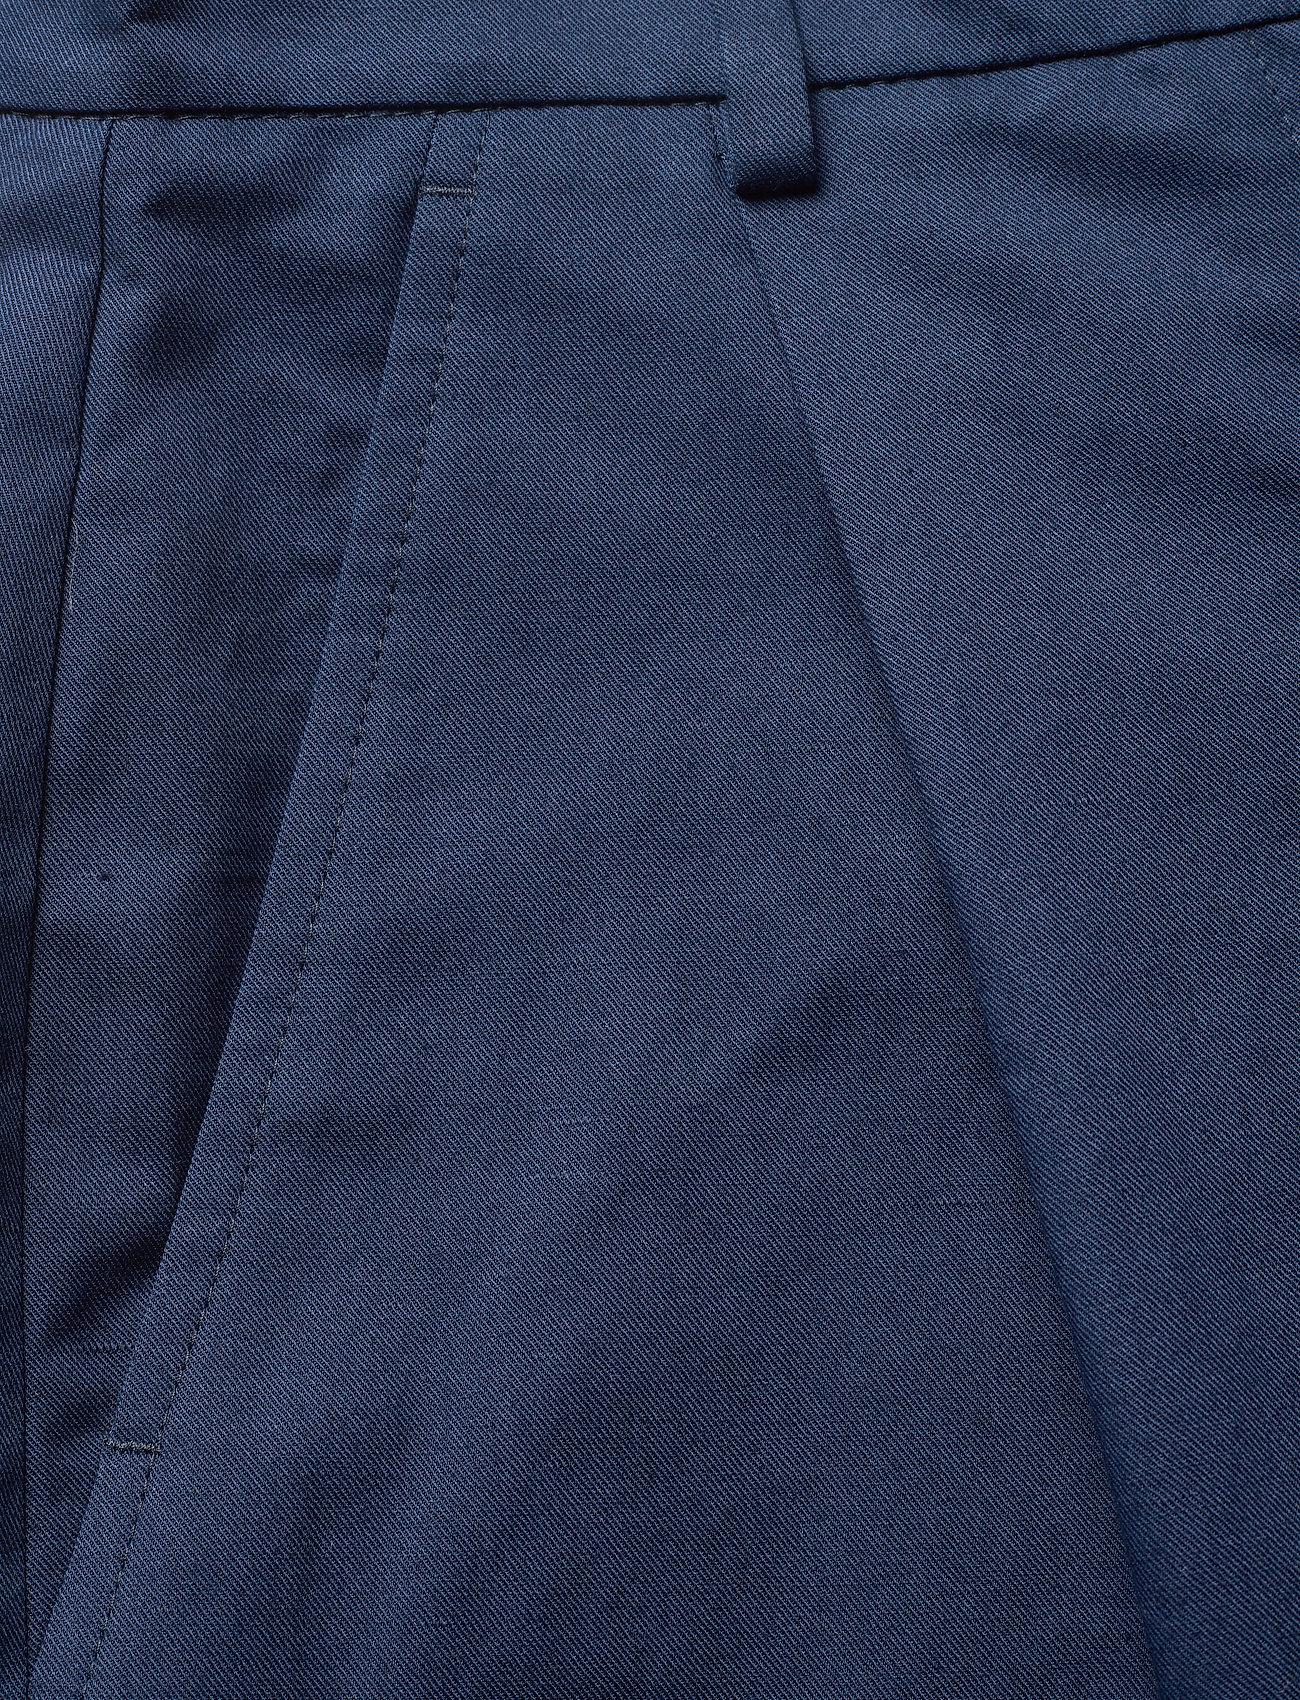 Weekend Max Mara - VISINO - casual korte broeken - ultramarine - 3